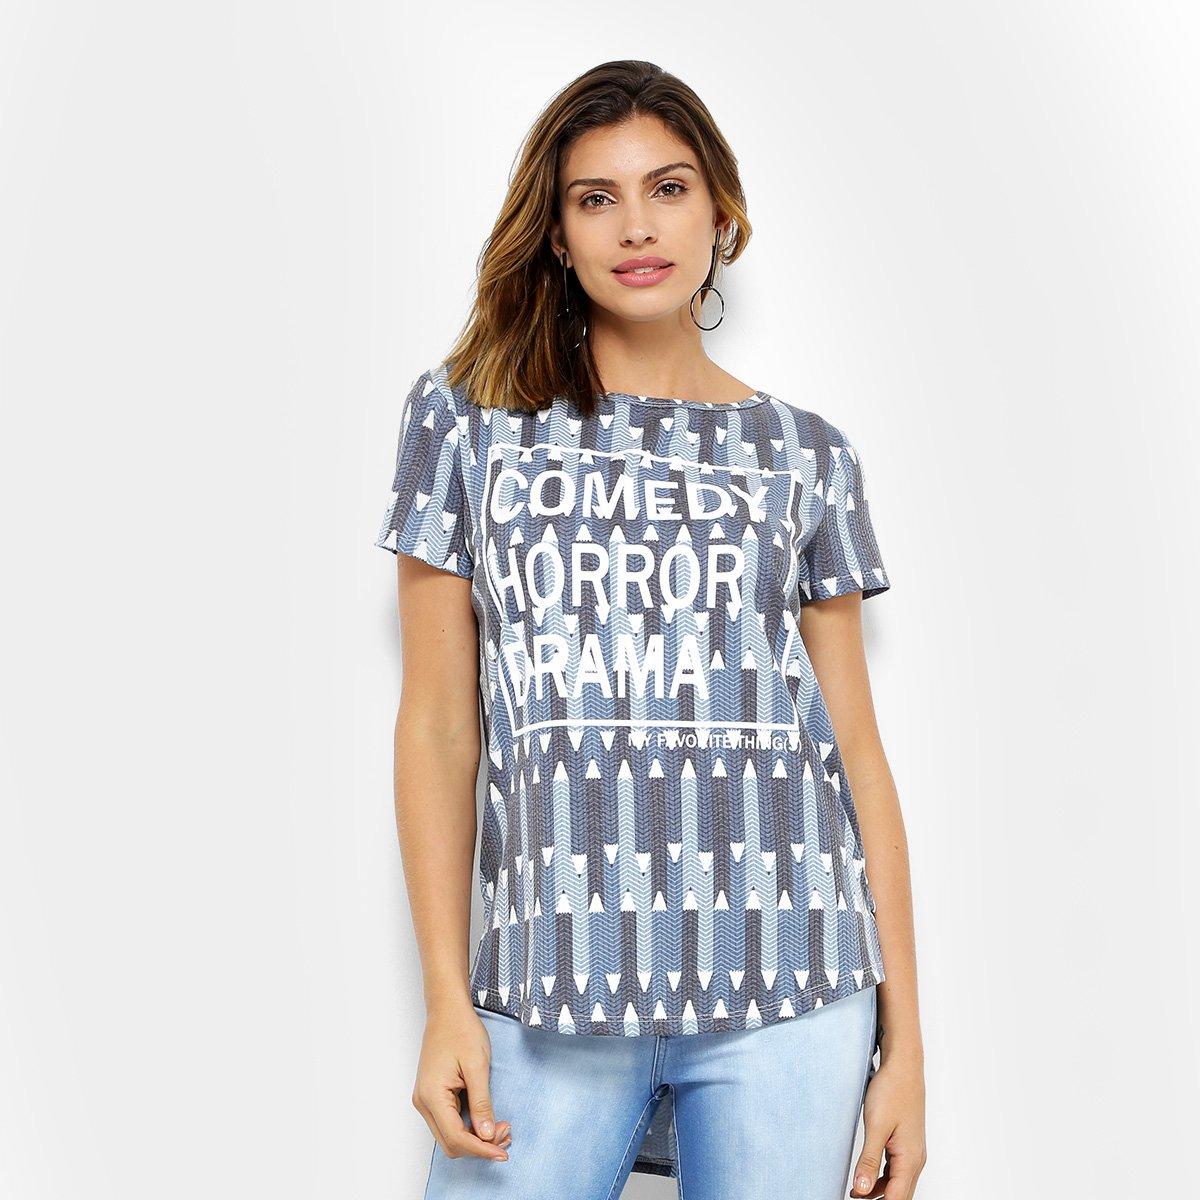 a63ba71b59 Camiseta My Favorite Thing (s) Alongada Estampada Feminina